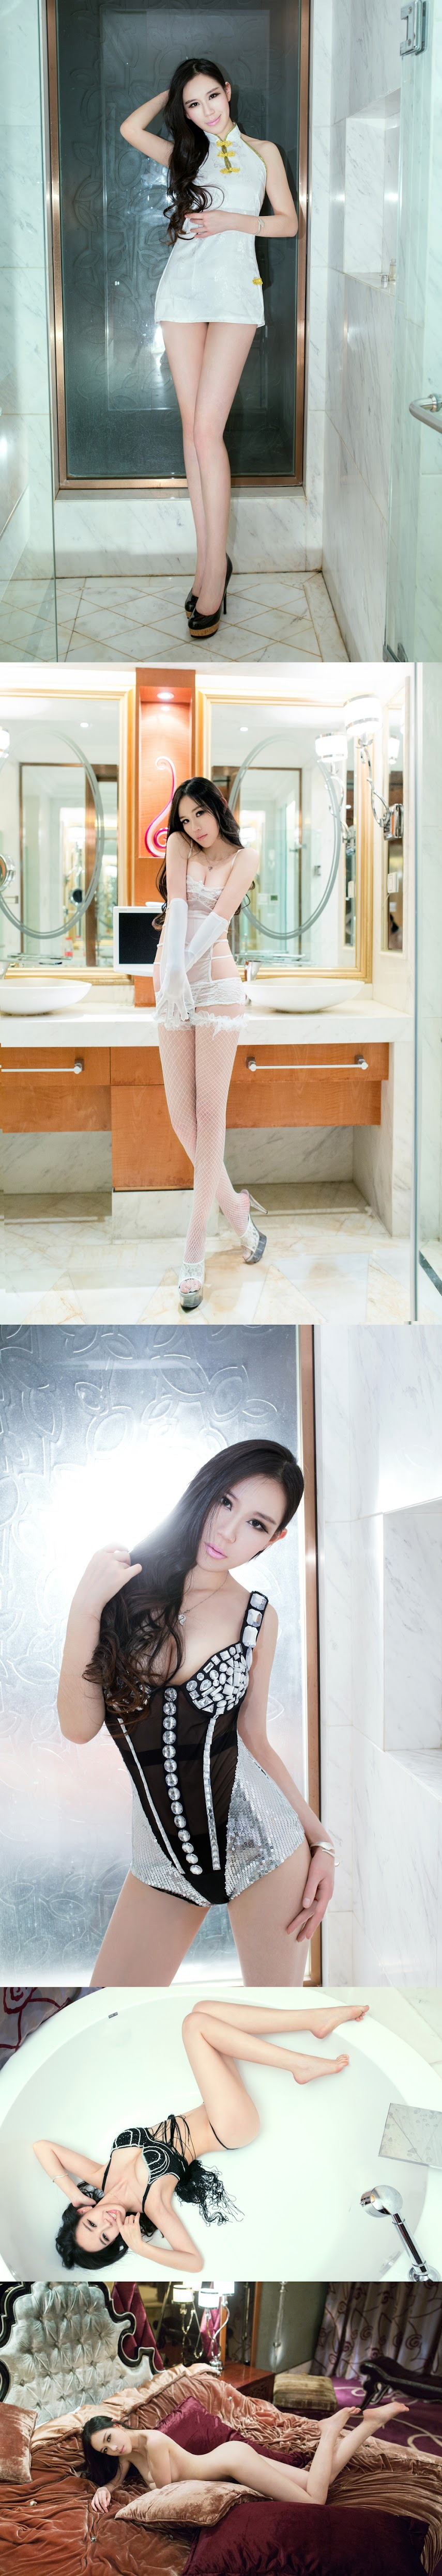 TuiGirl 09 王可欣 - idols